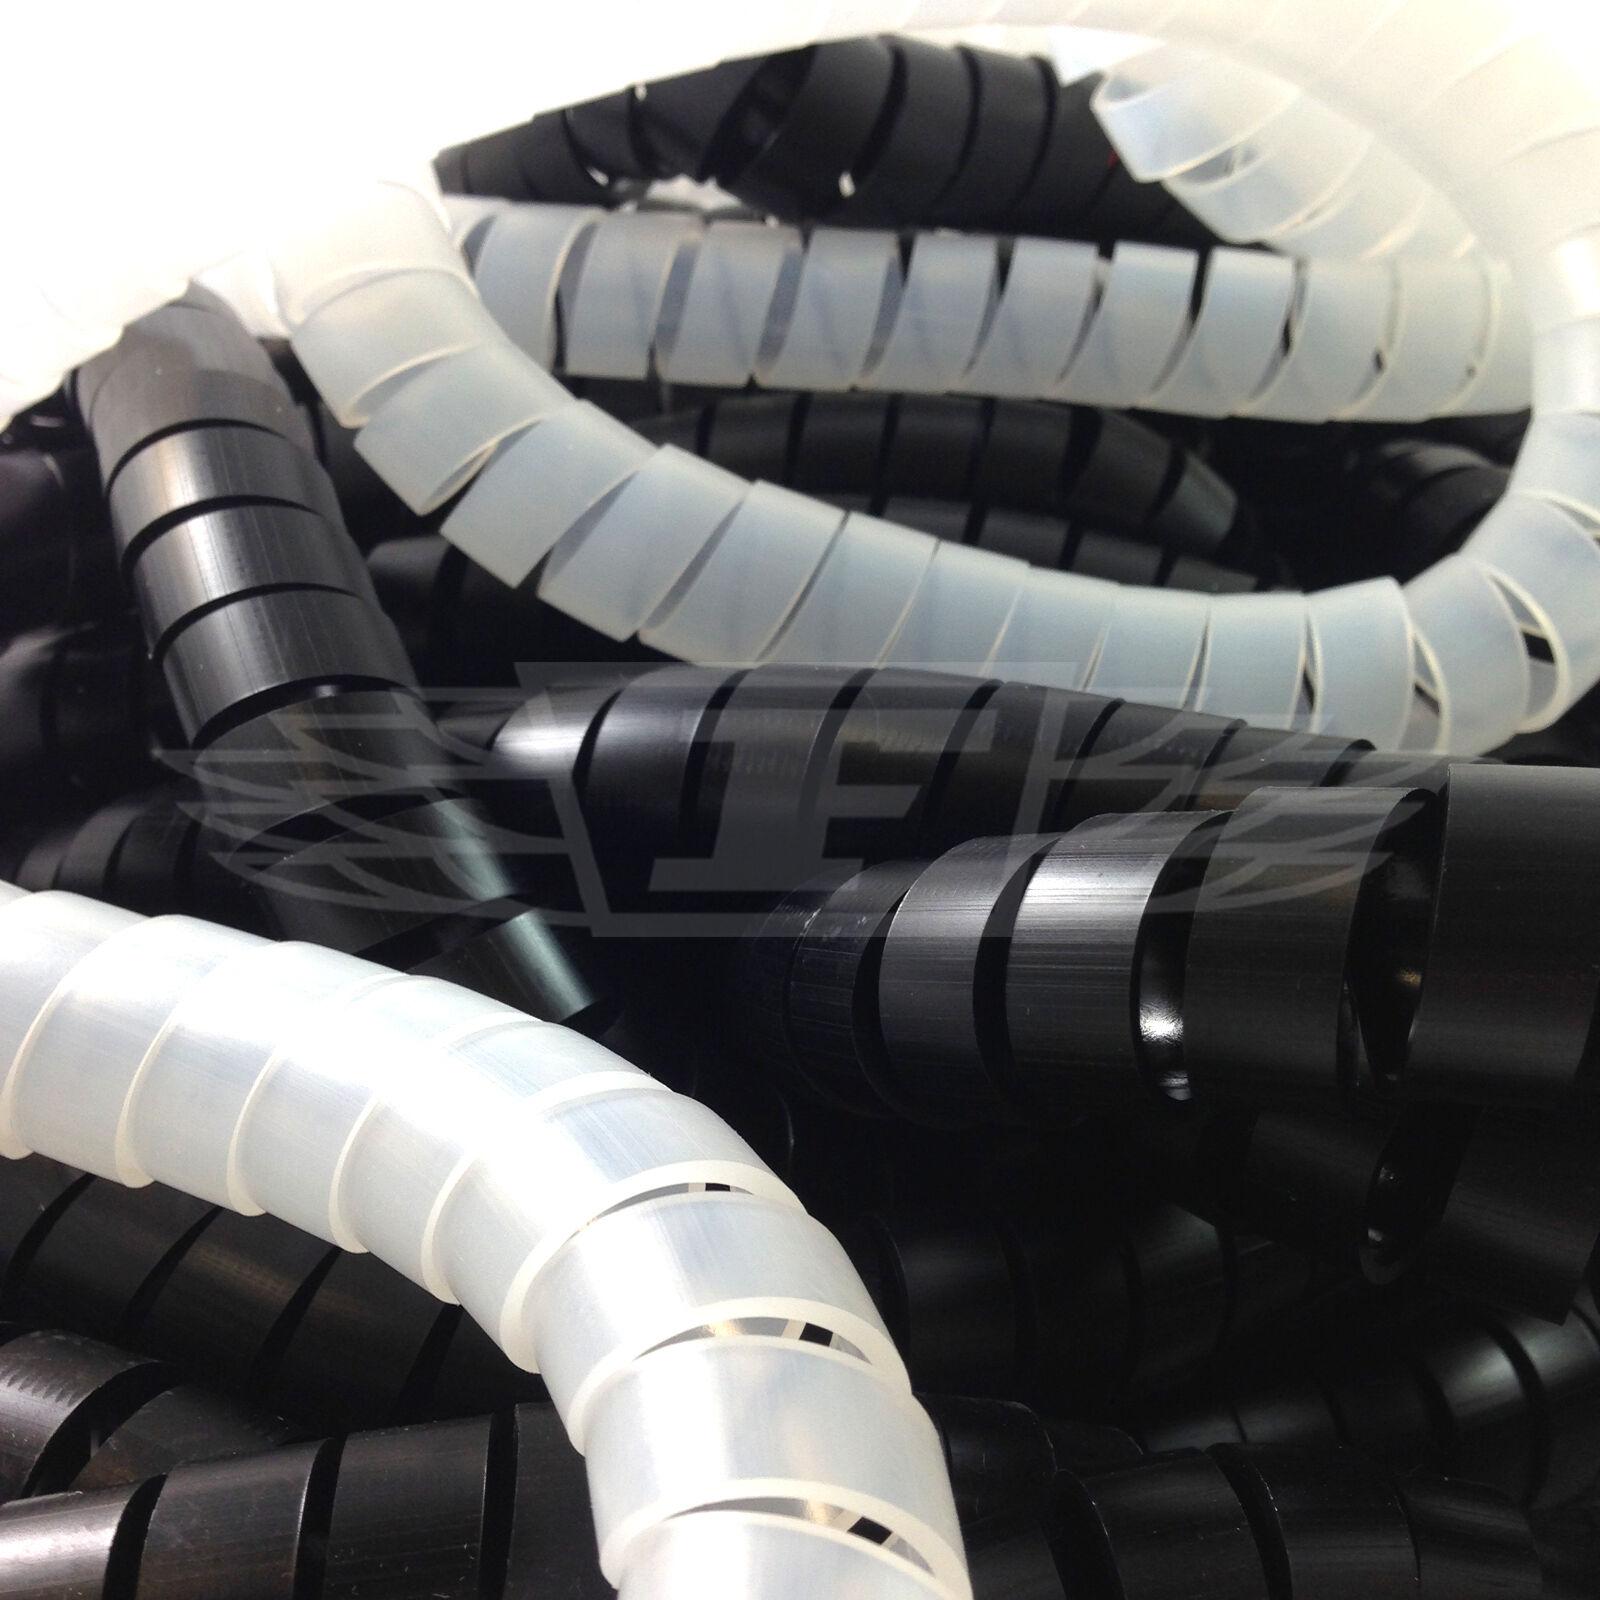 WIRE BINDING ORGANISER SPIRAL WRAP HEATSHRINK 6-30mm BLACK CABLE TIDY